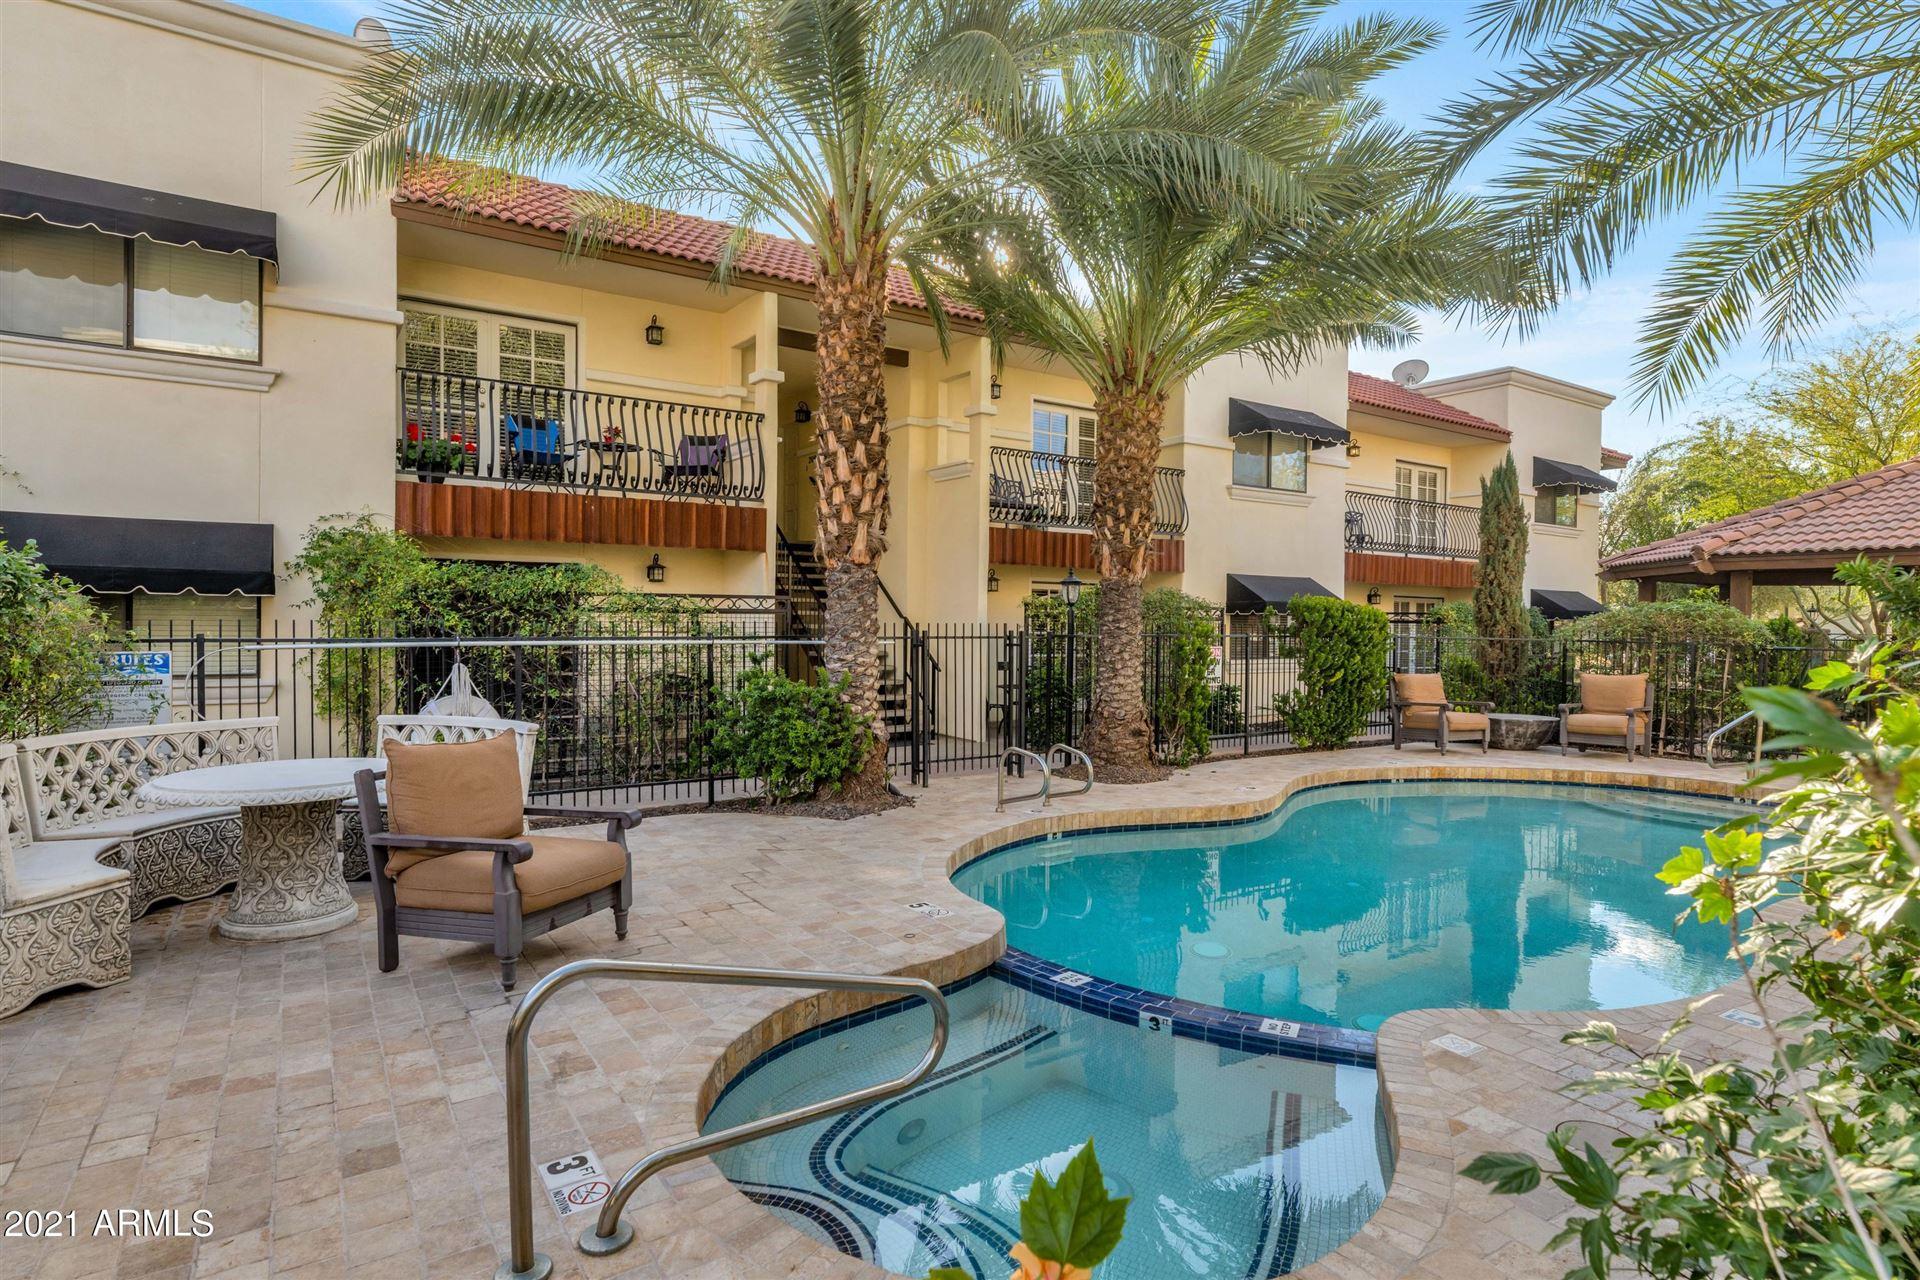 7910-7920 E Wilshire Drive, Scottsdale, AZ 85257 - MLS#: 6199107